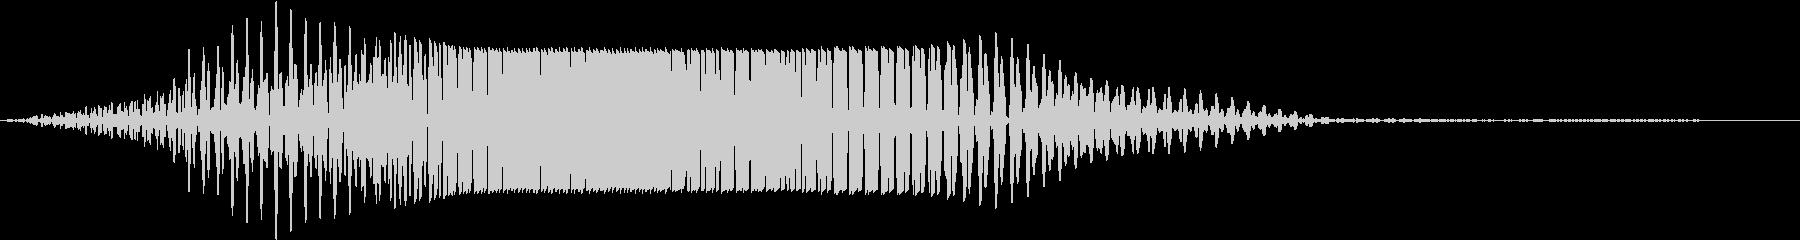 SF通過音01-04の未再生の波形